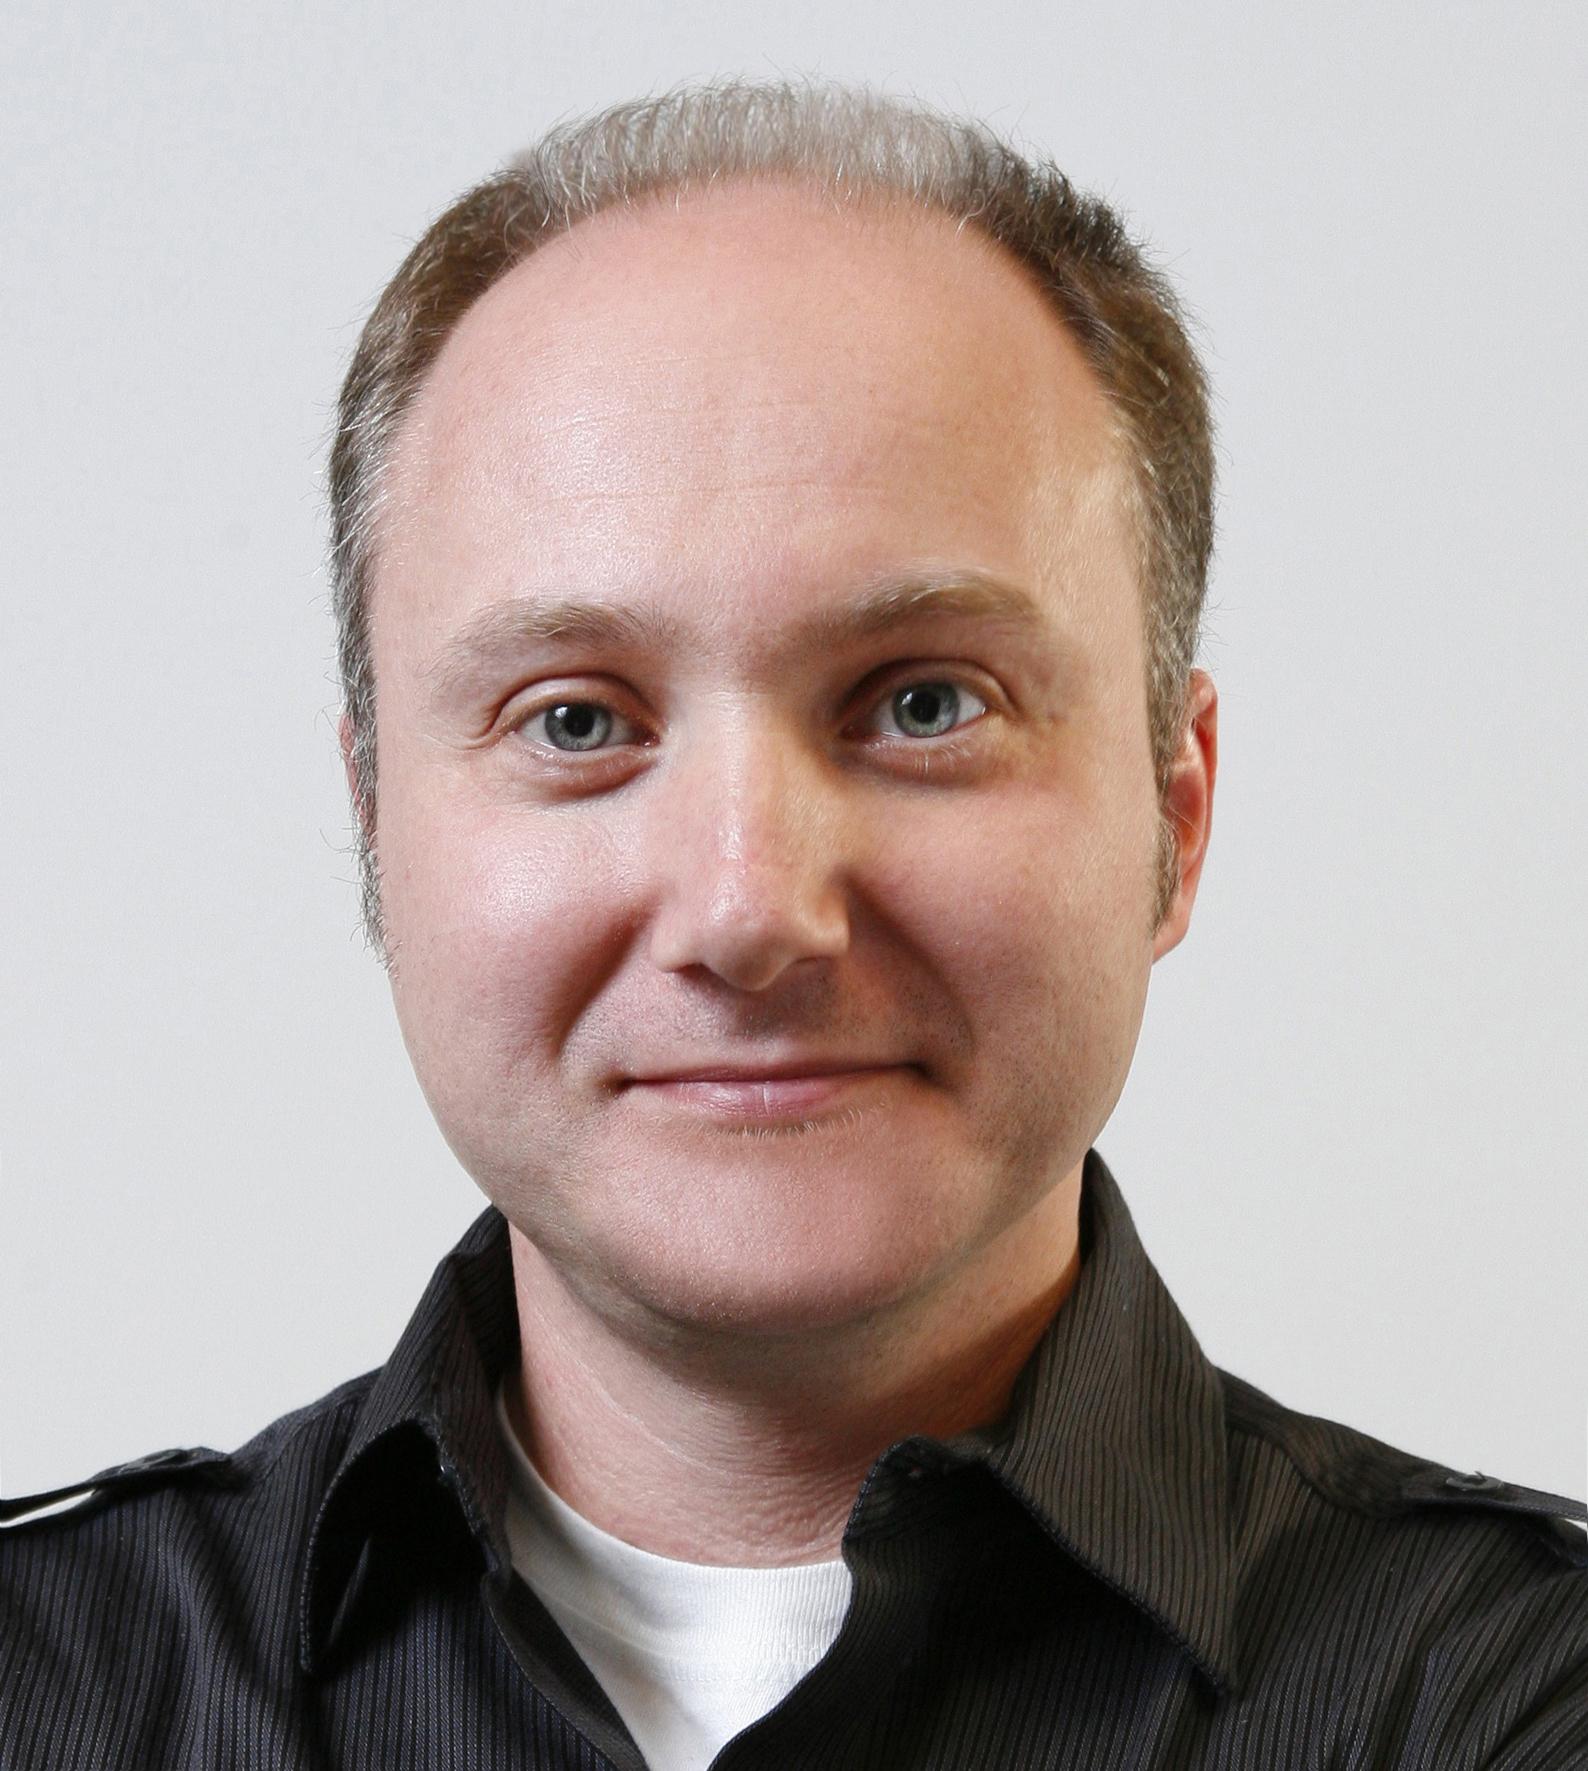 Oz John Tekson, PhD